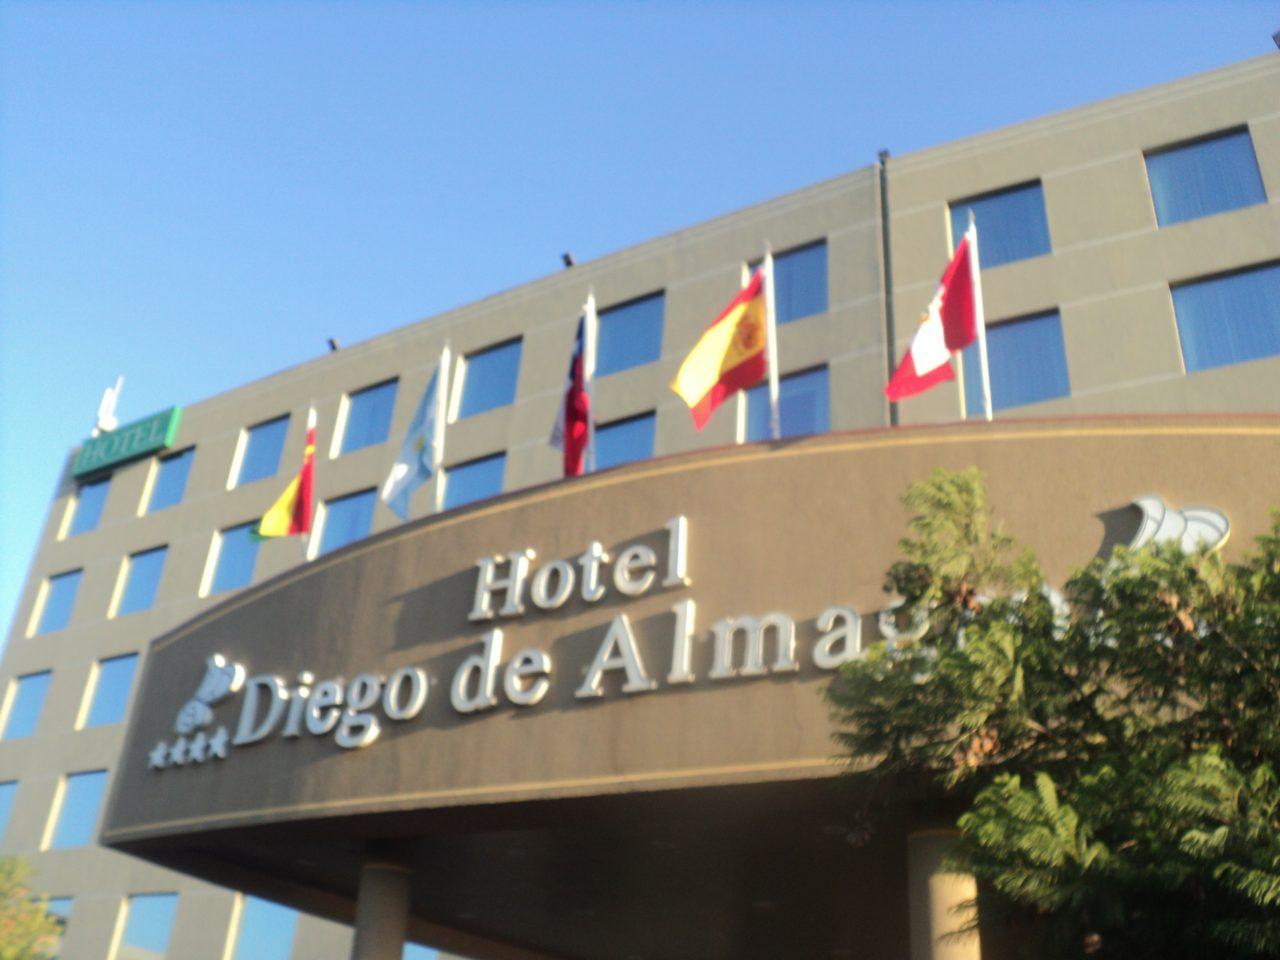 03-hotel-diego-de-almagro-1280x960.jpg